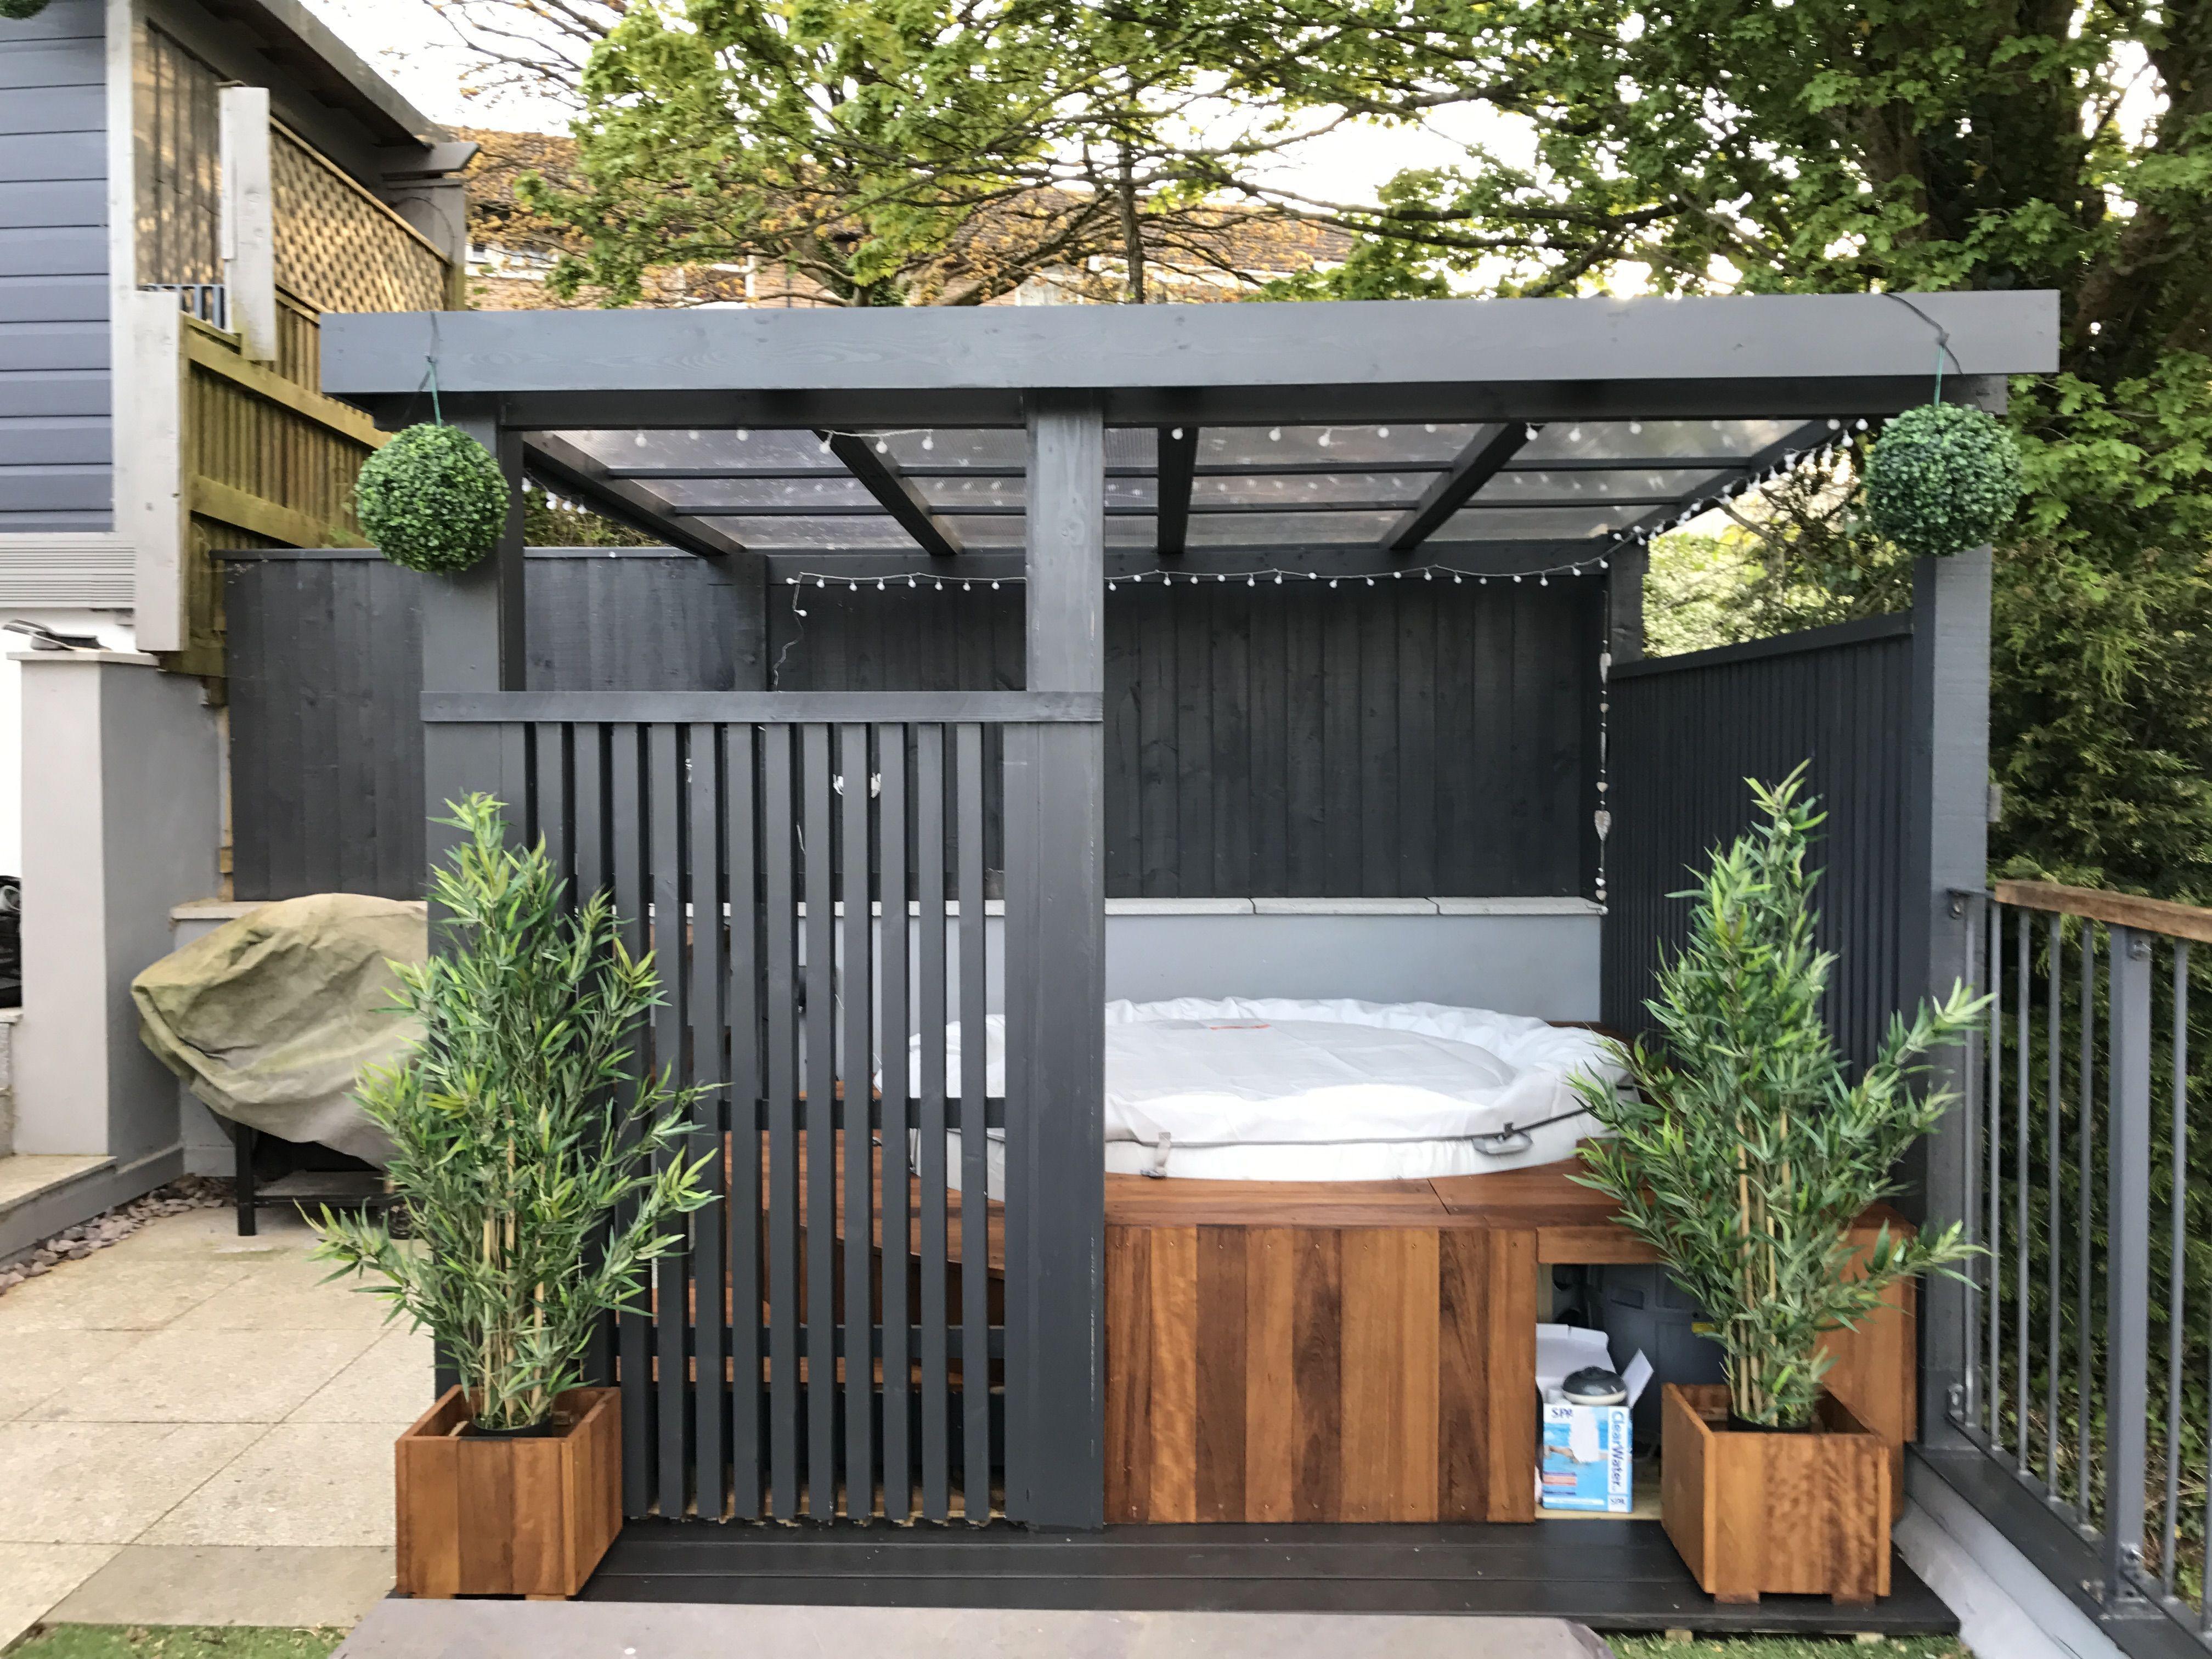 Modern Grey Pergola Lazy Spa Hot Tub Iroko Surround Https Www Divesanddollar Com Pool Safety Fence Hot Tub Landscaping Hot Tub Backyard Hot Tub Patio Modern patio with hot tub